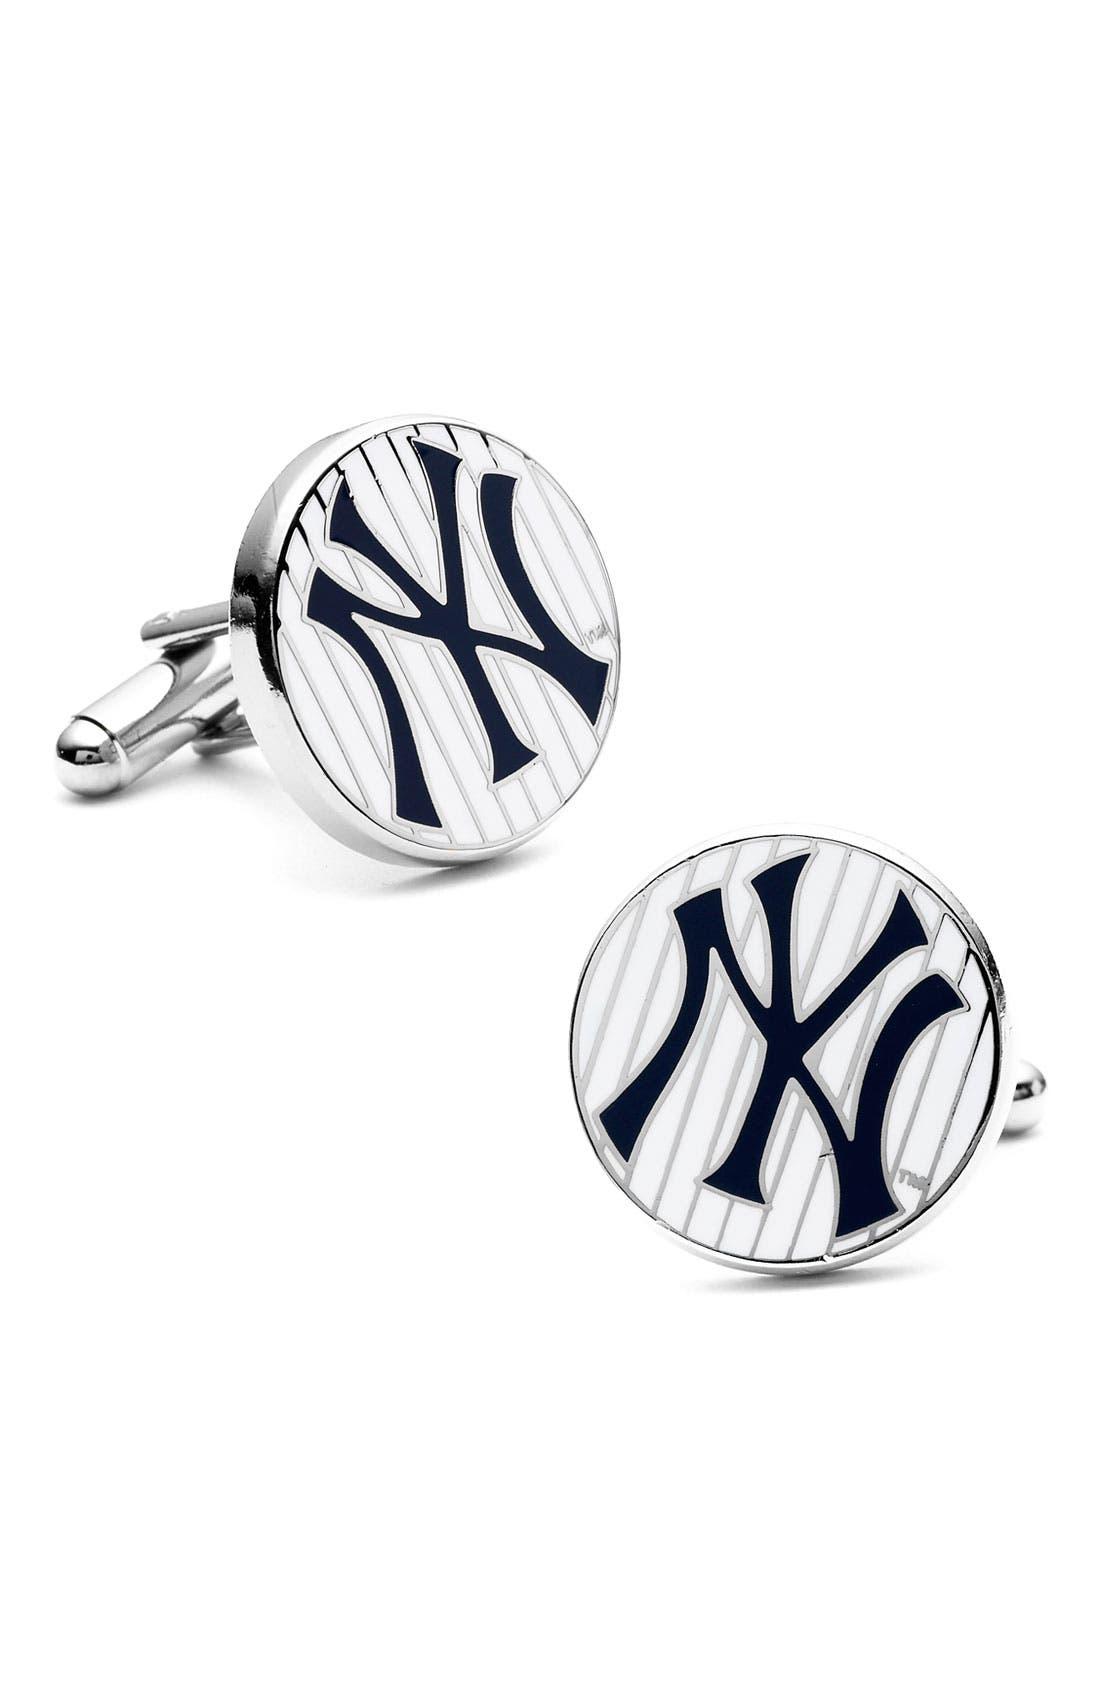 CUFFLINKS, INC. 'New York Yankees' Cuff Links, Main, color, WHITE/ BLUE